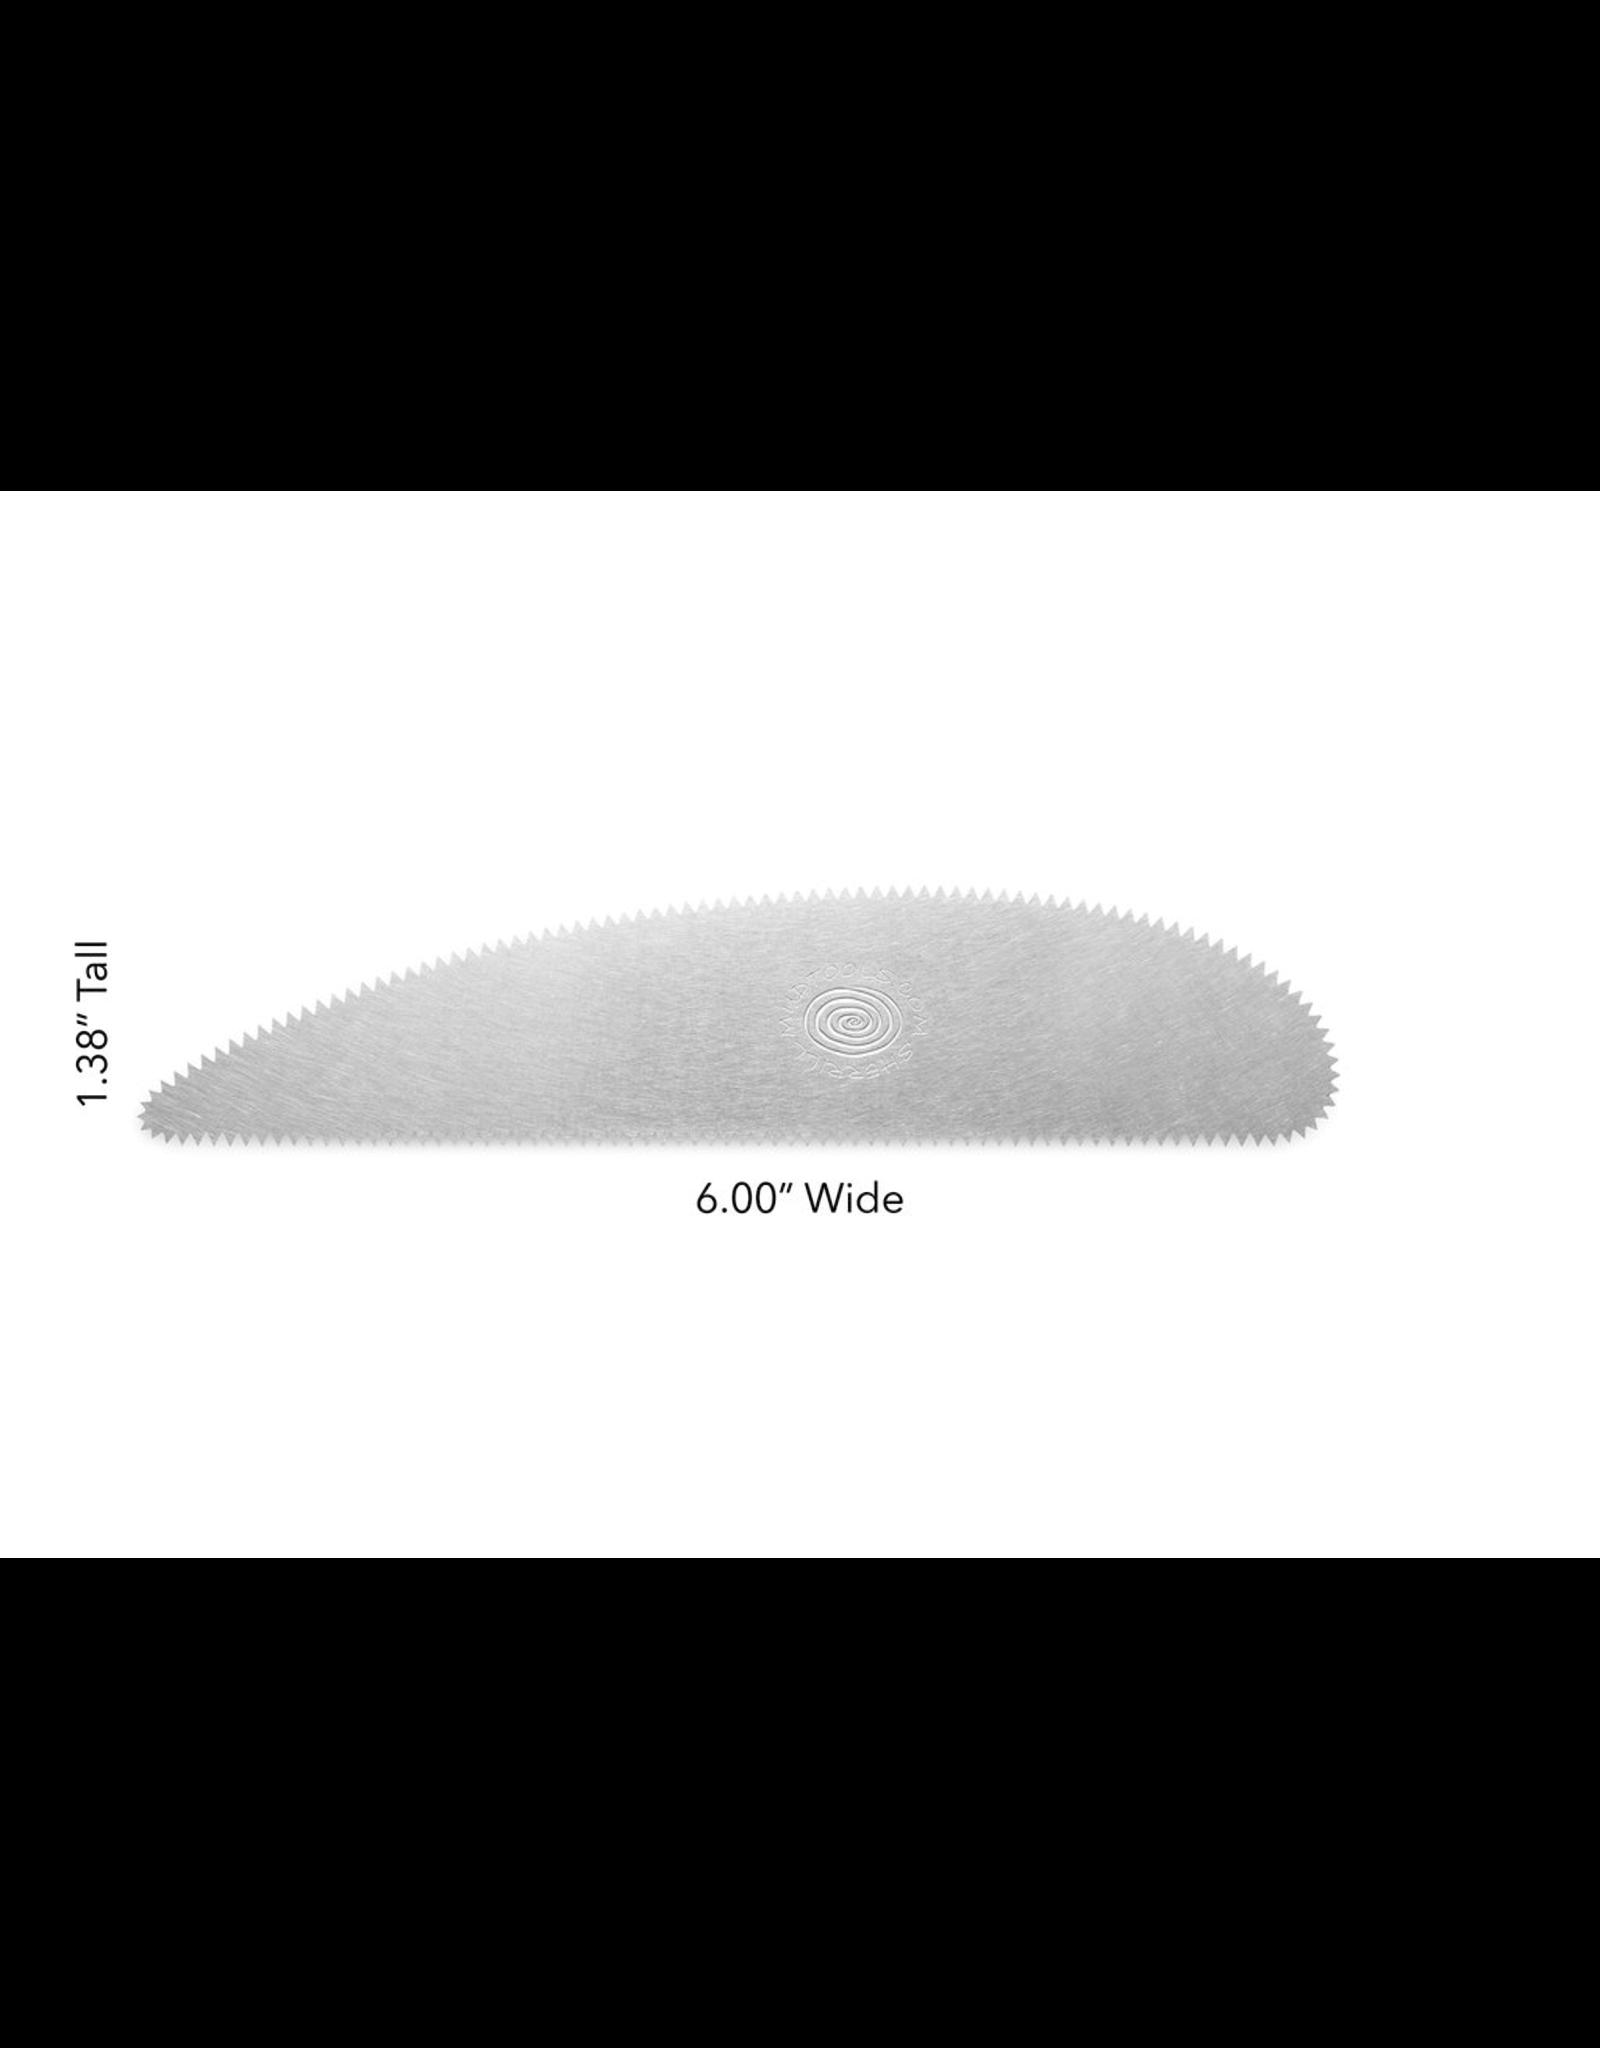 Mudtools Long Scraper Rib (Regular Serrated) stainless steel